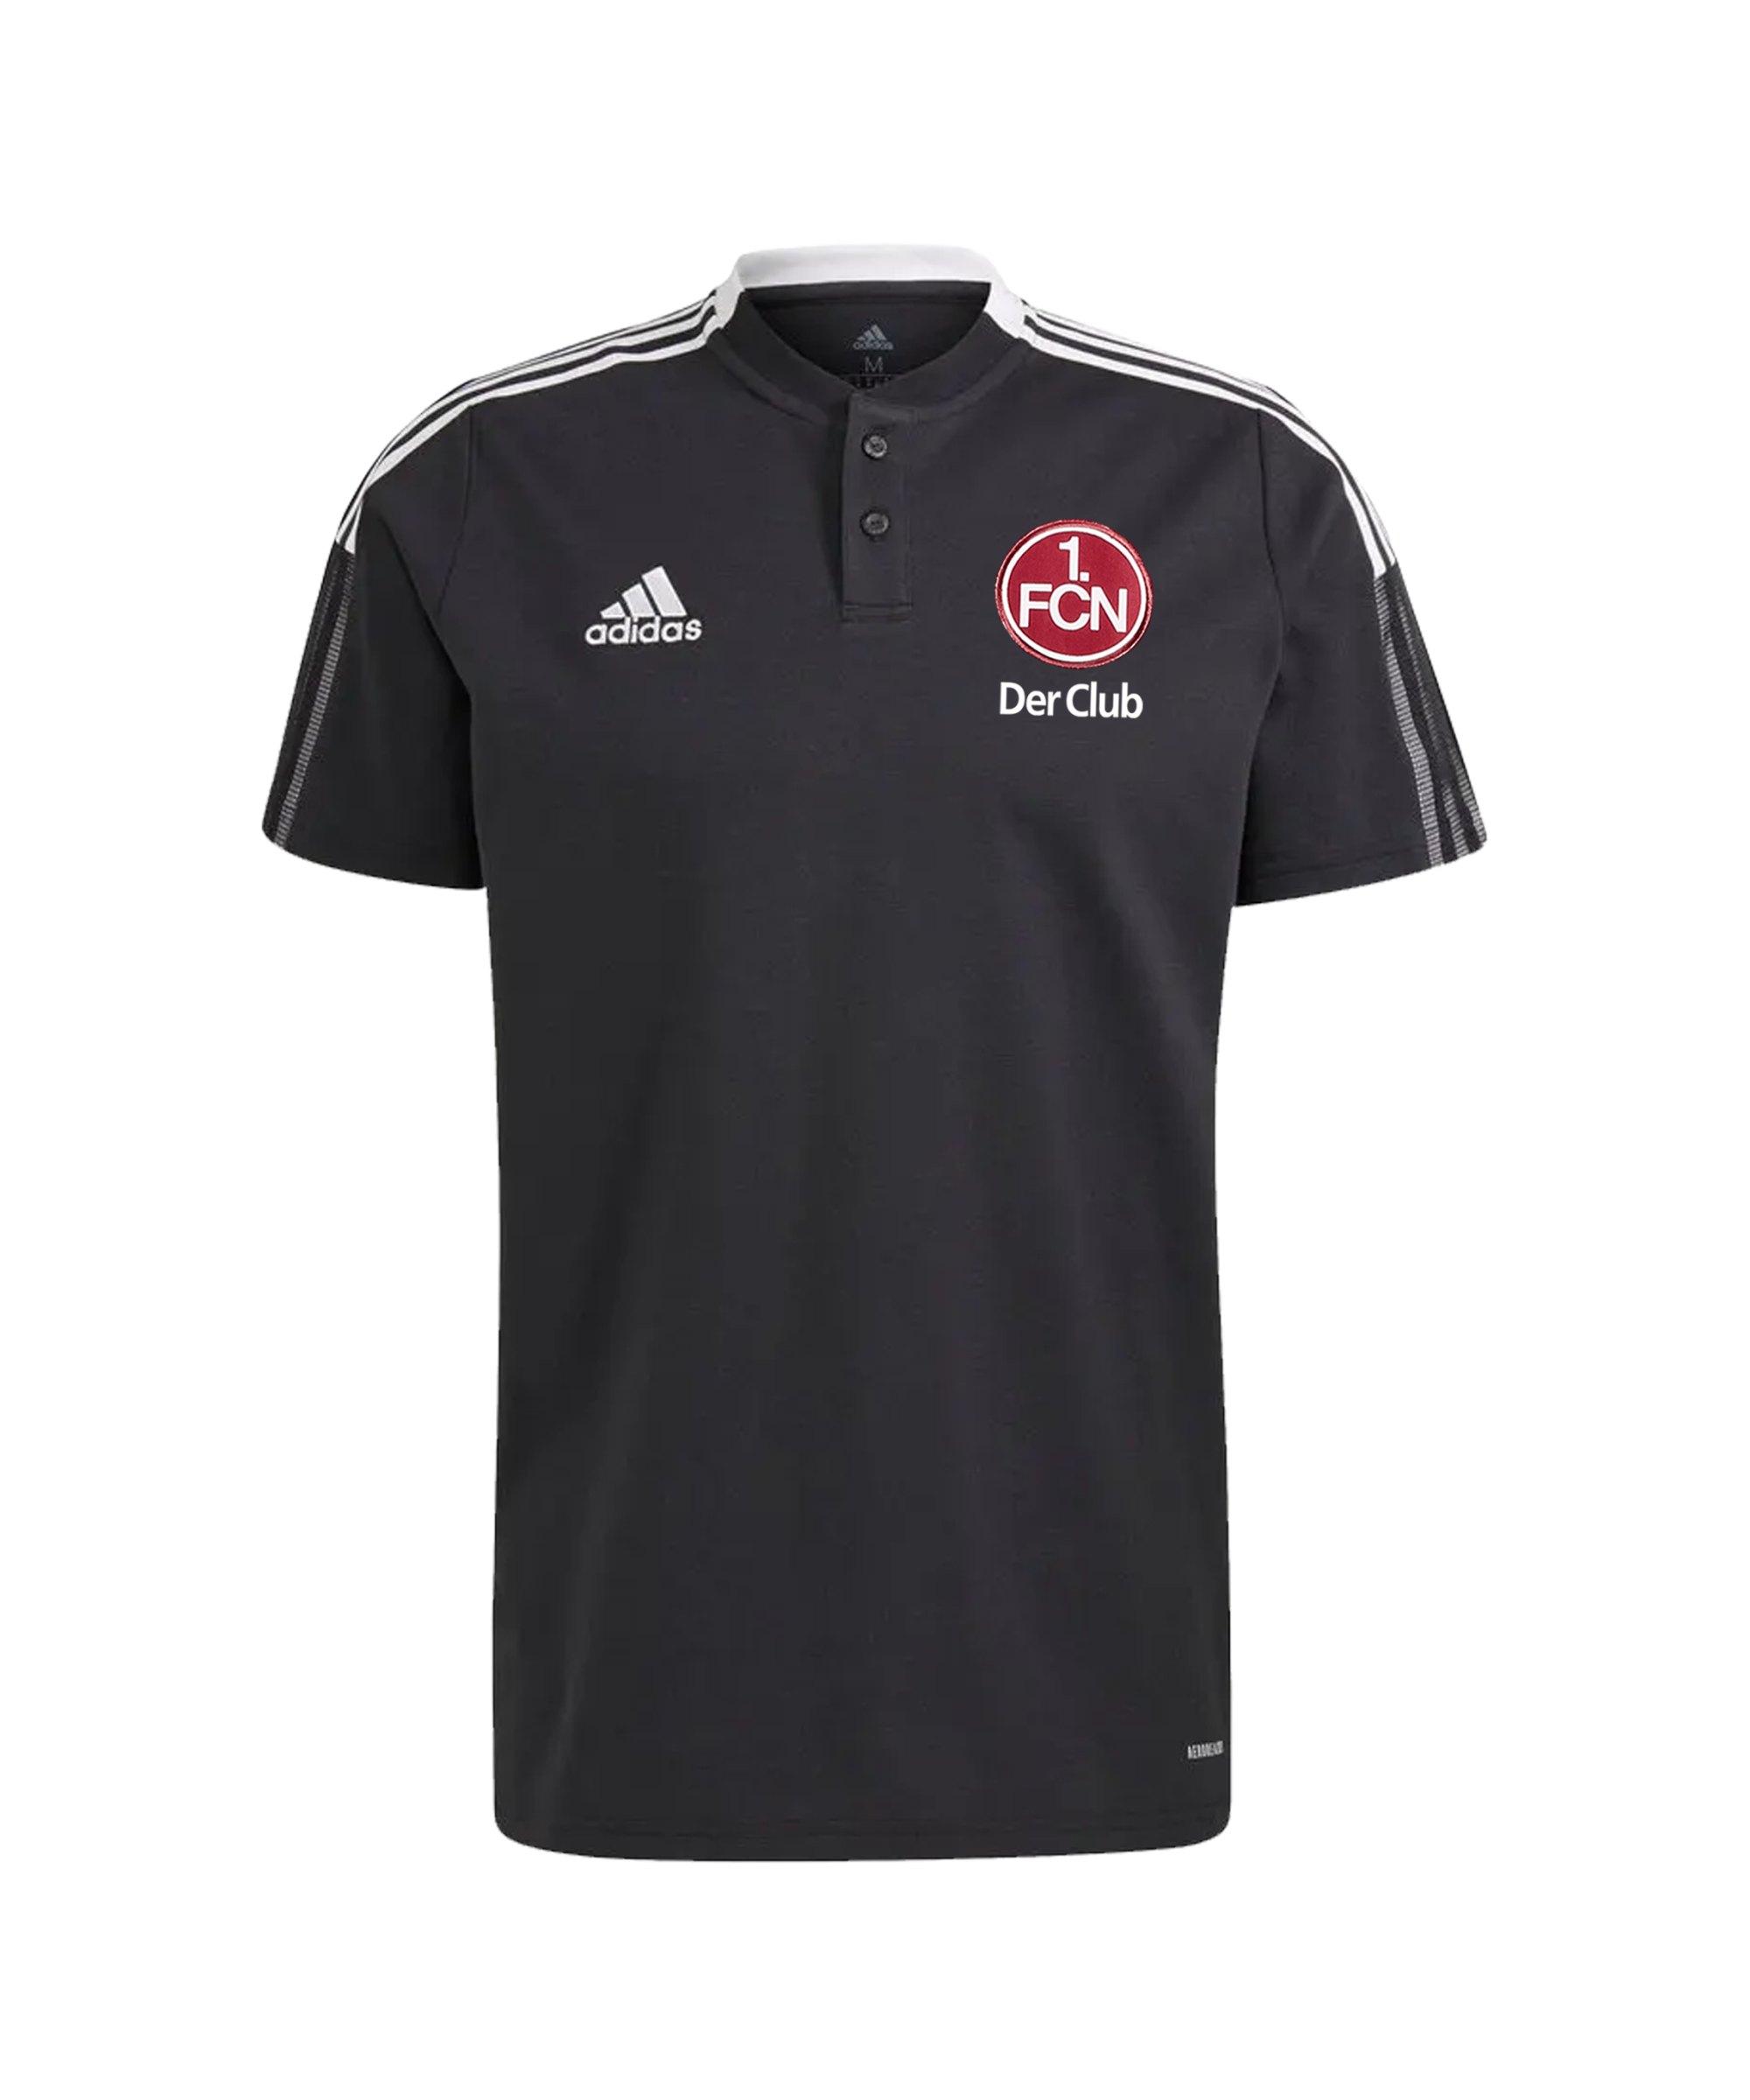 adidas 1. FC Nürnberg Polo Schwarz - schwarz